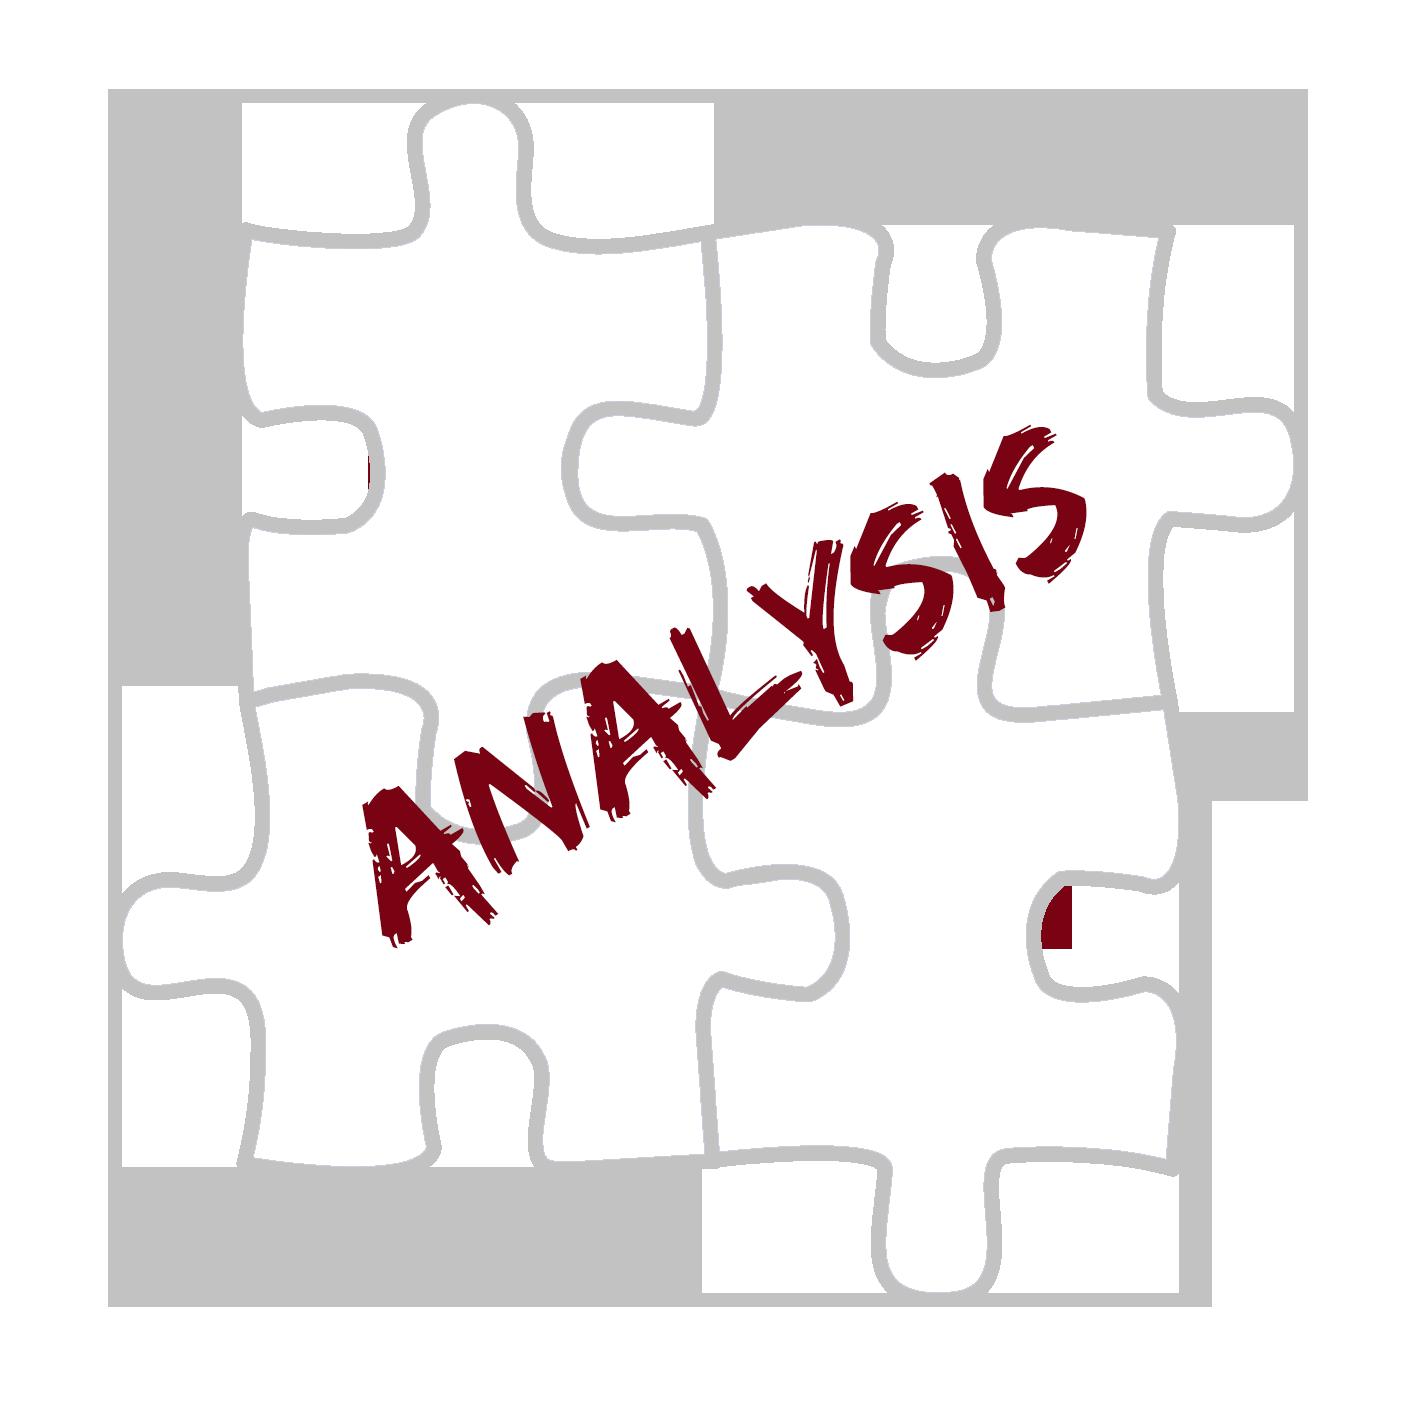 Integrated Marketing analysis